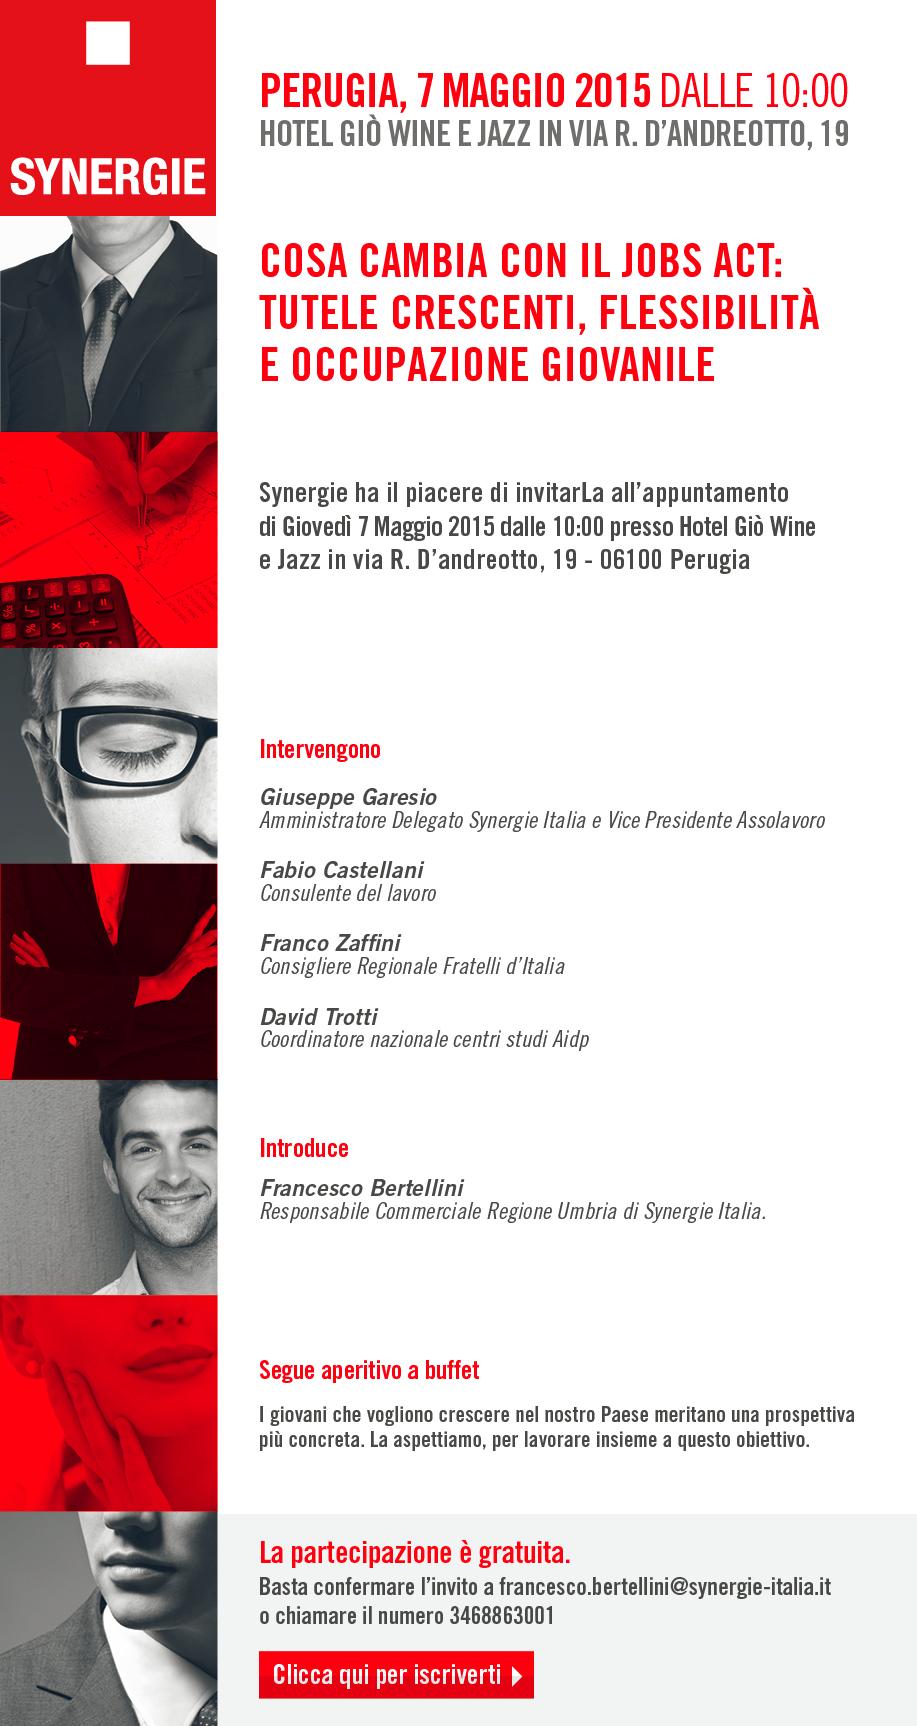 Emejing Synergie Reggio Emilia Contemporary - bakeroffroad.us ...